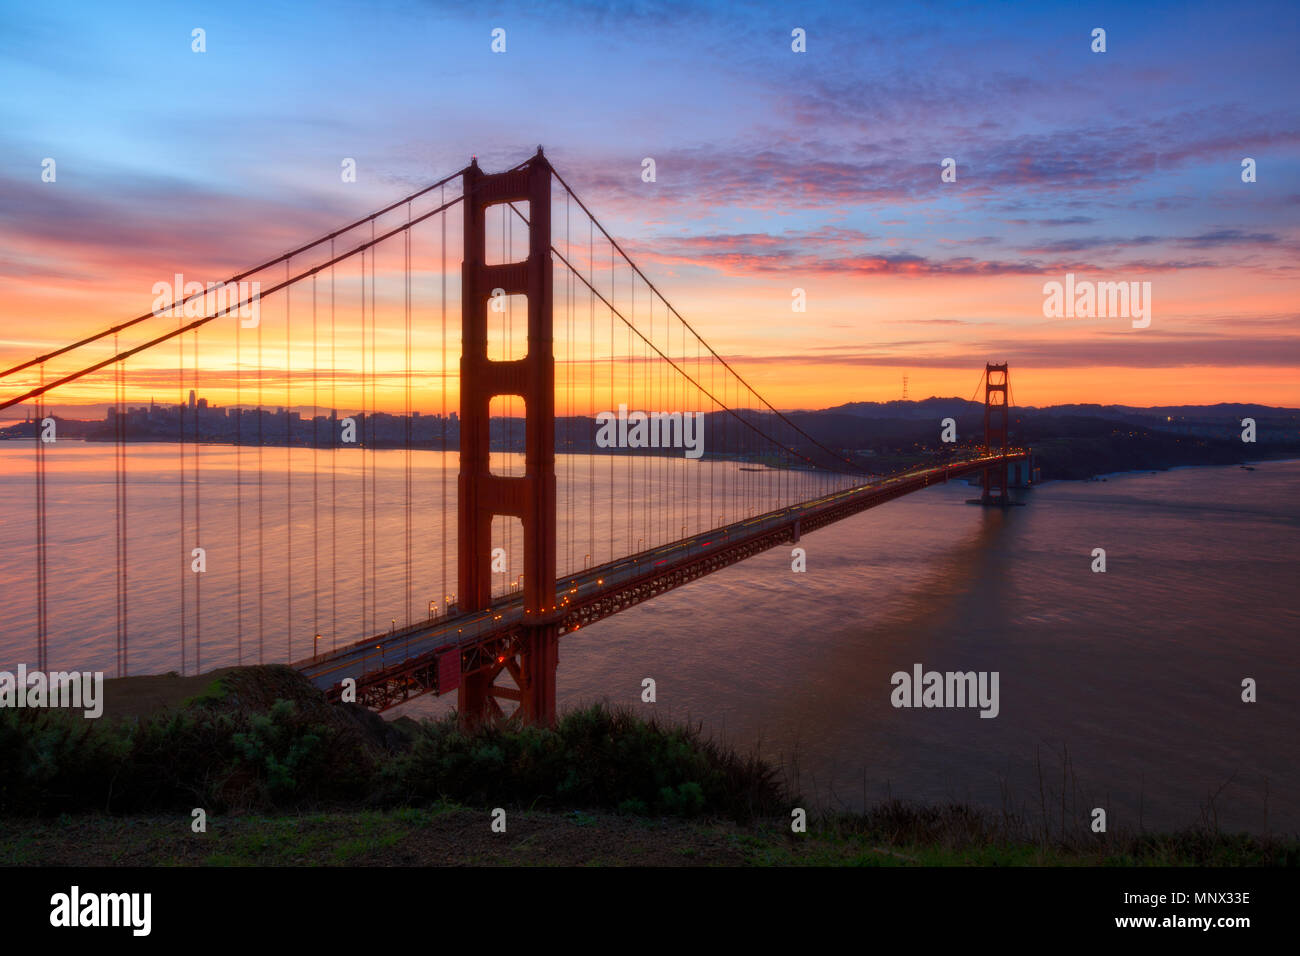 The iconic Golden Gate Bridge during a beautiful sunrise. - Stock Image